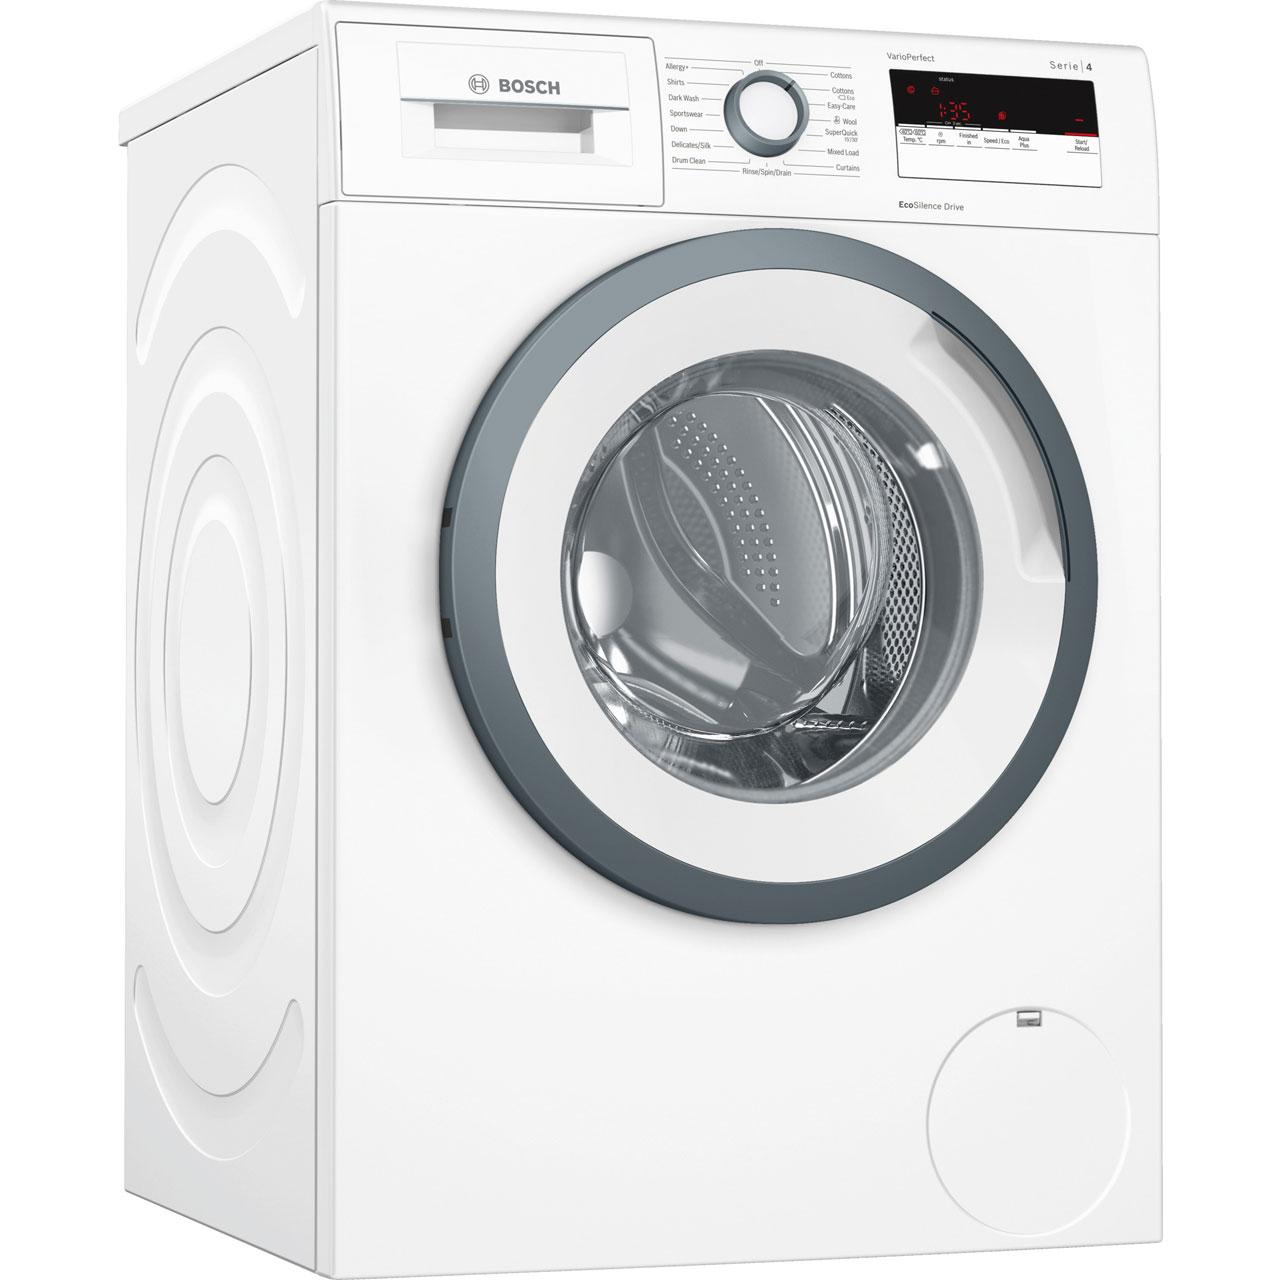 Bosch Serie 4 WAN28150GB Washing Machine - Appliance Spotter